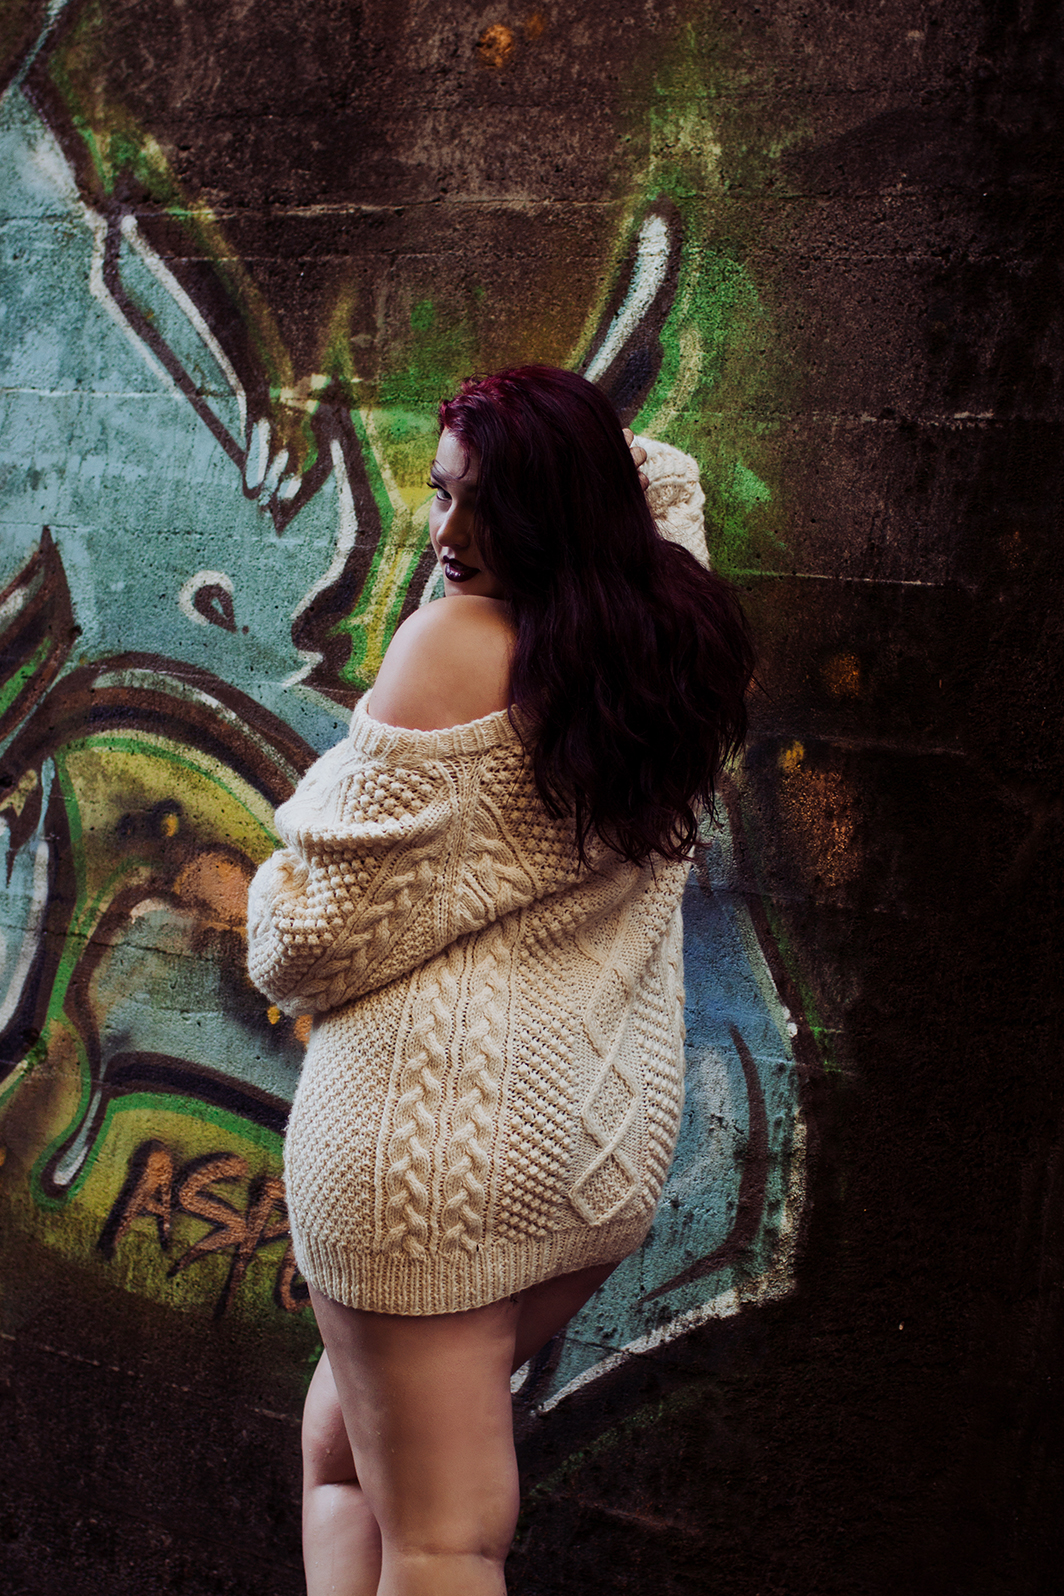 Victoria-BC-Outdoor-Boudoir-Moss-Photography-65.jpg